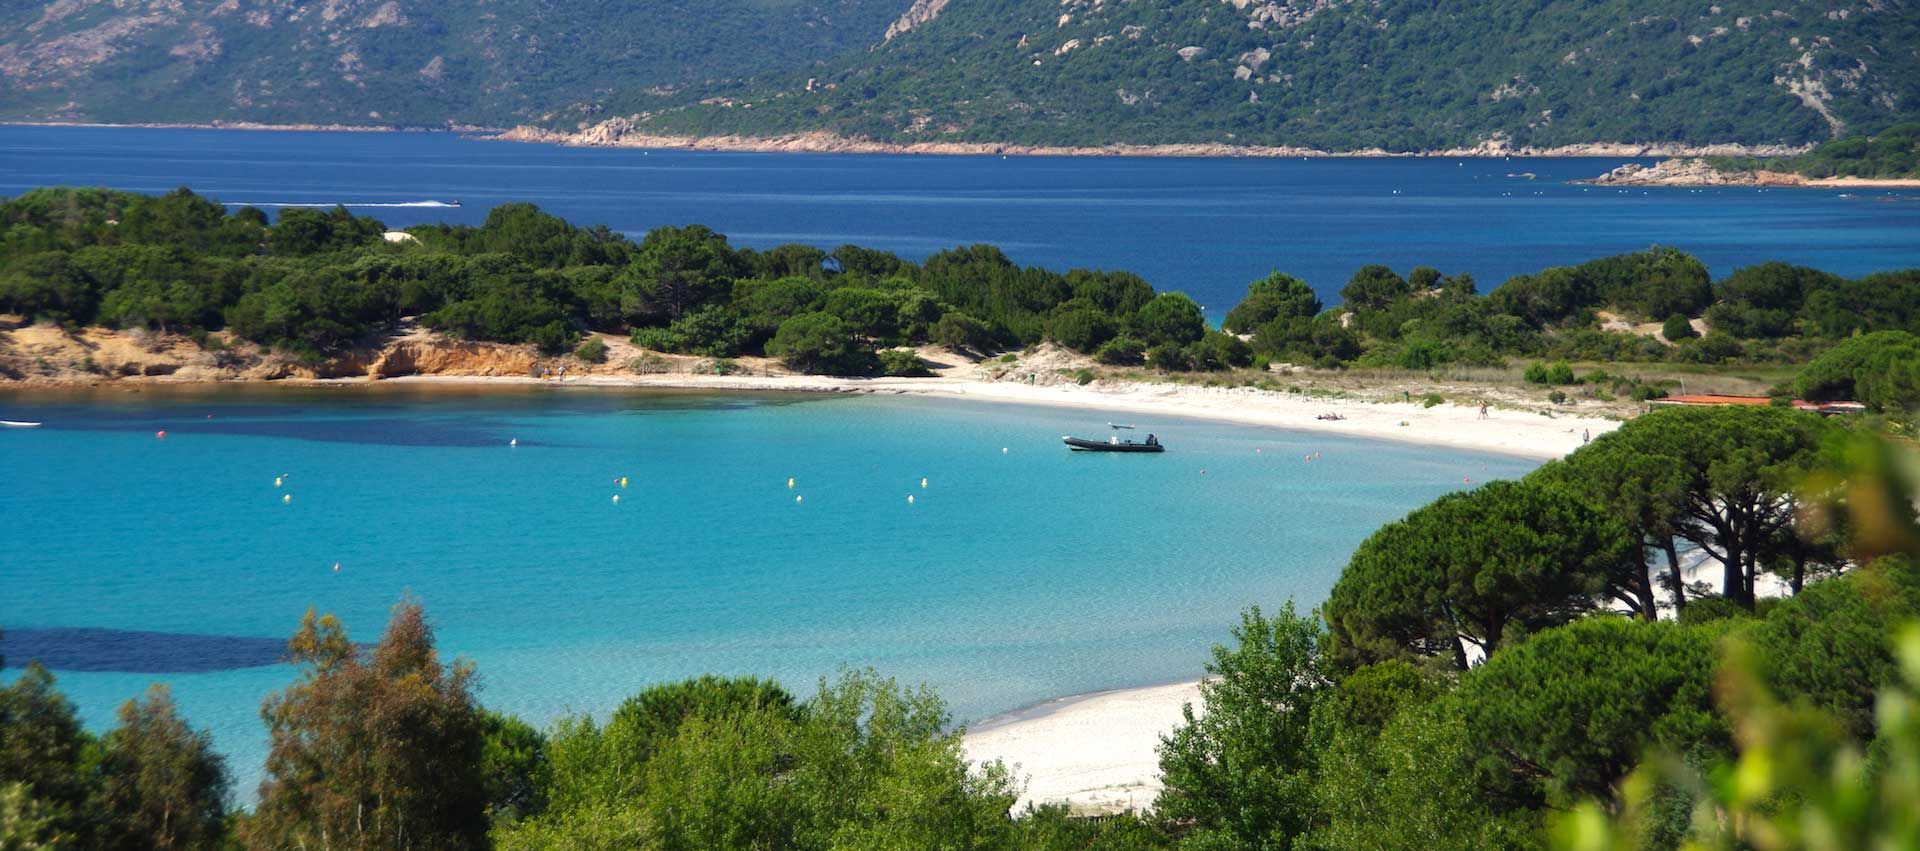 ActivitesCentre CorseCote OrientaleGrand ValincoOuest CorsePays AjaccienSud Corse